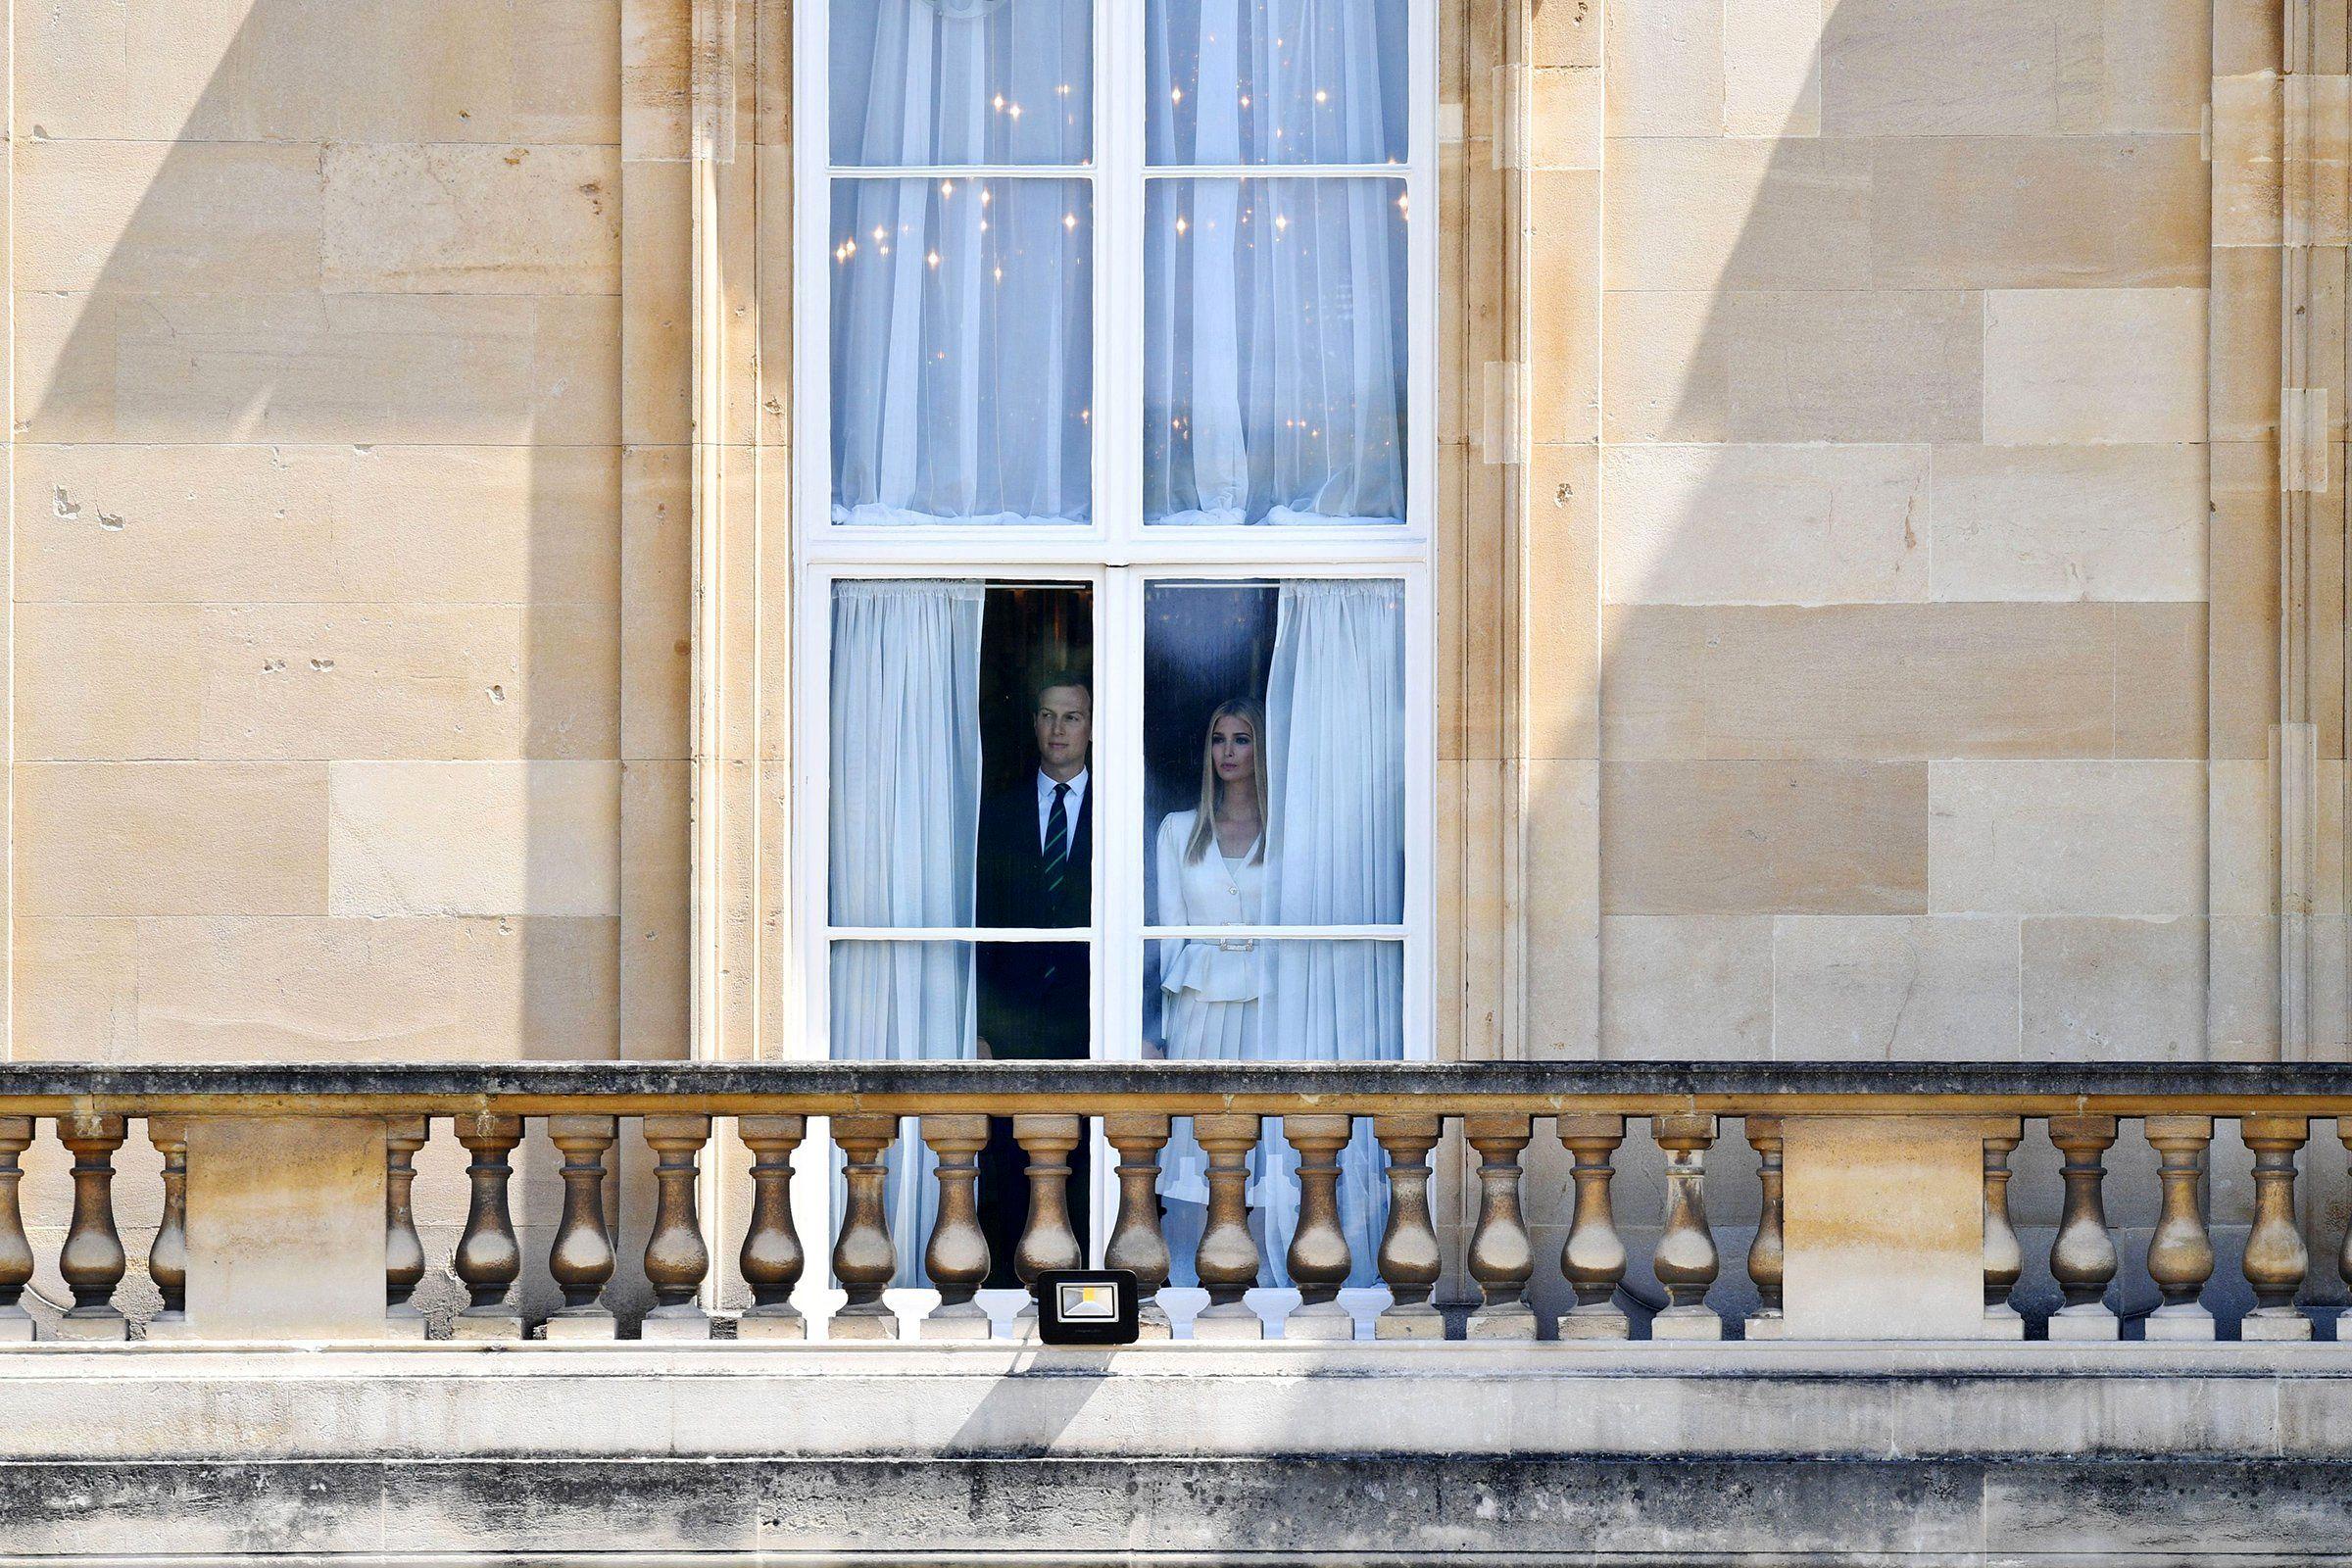 Jared Kushner, senior advisor to President Trump, and Ivanka Trump at Buckingham Palace during the President's state visit in June.